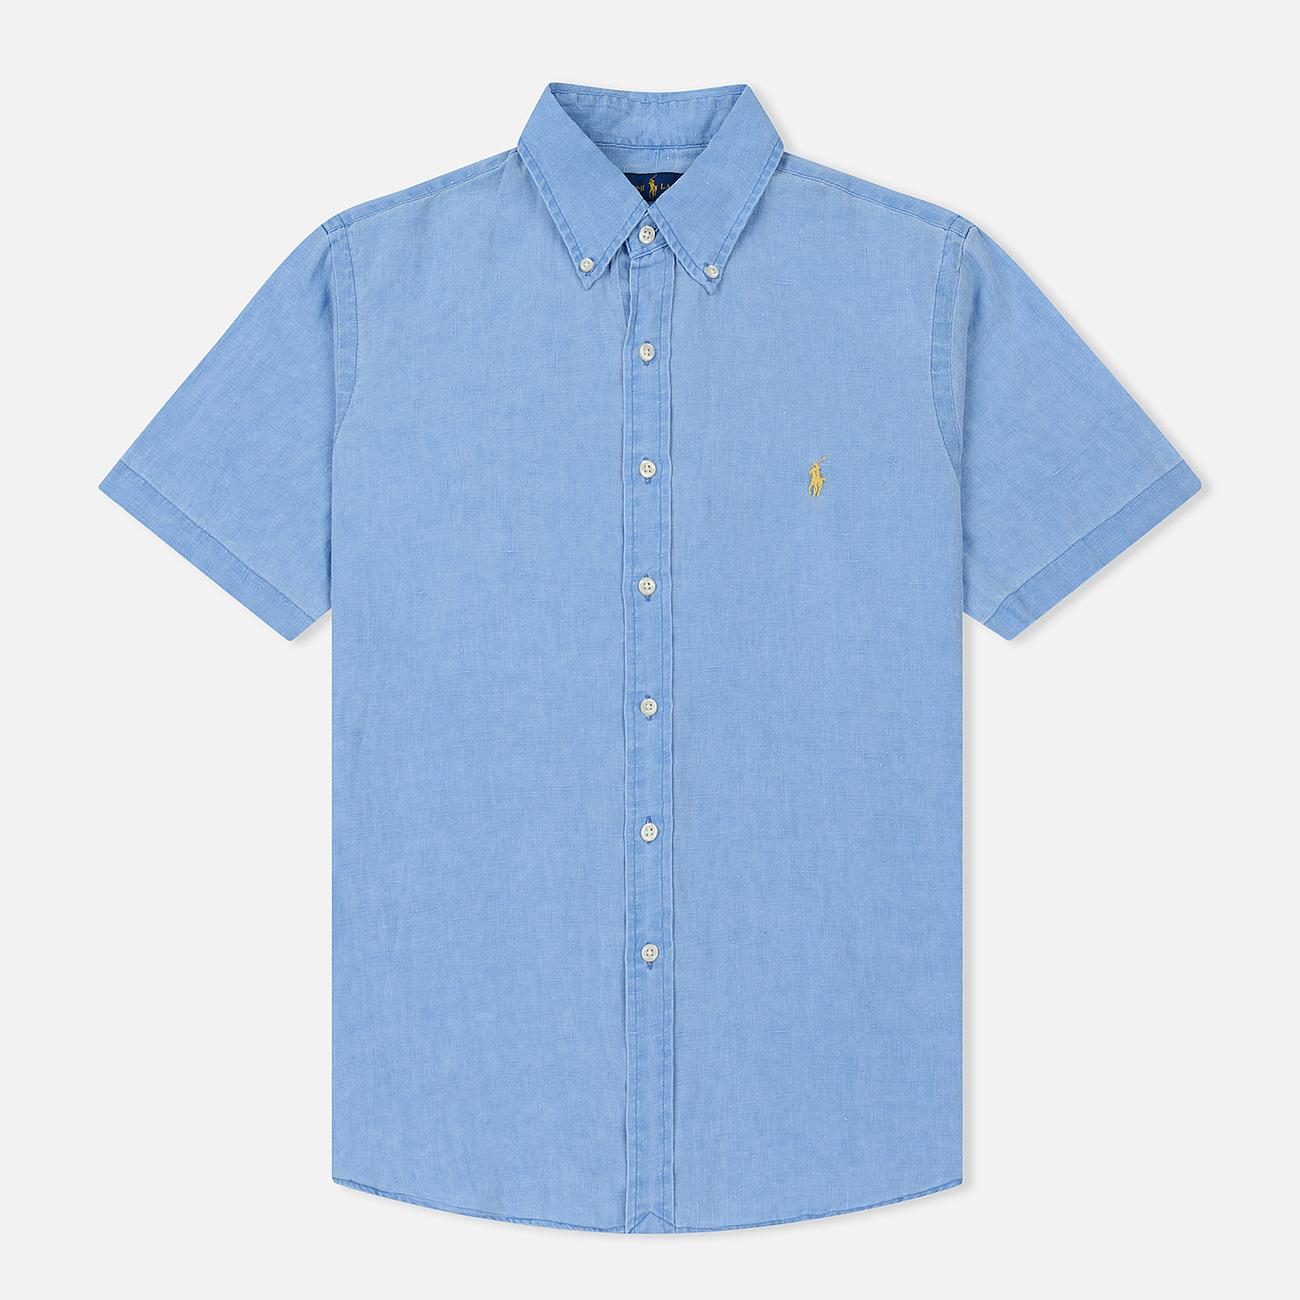 Мужская рубашка Polo Ralph Lauren Oxford Linen Slim Fit Riviera Blue